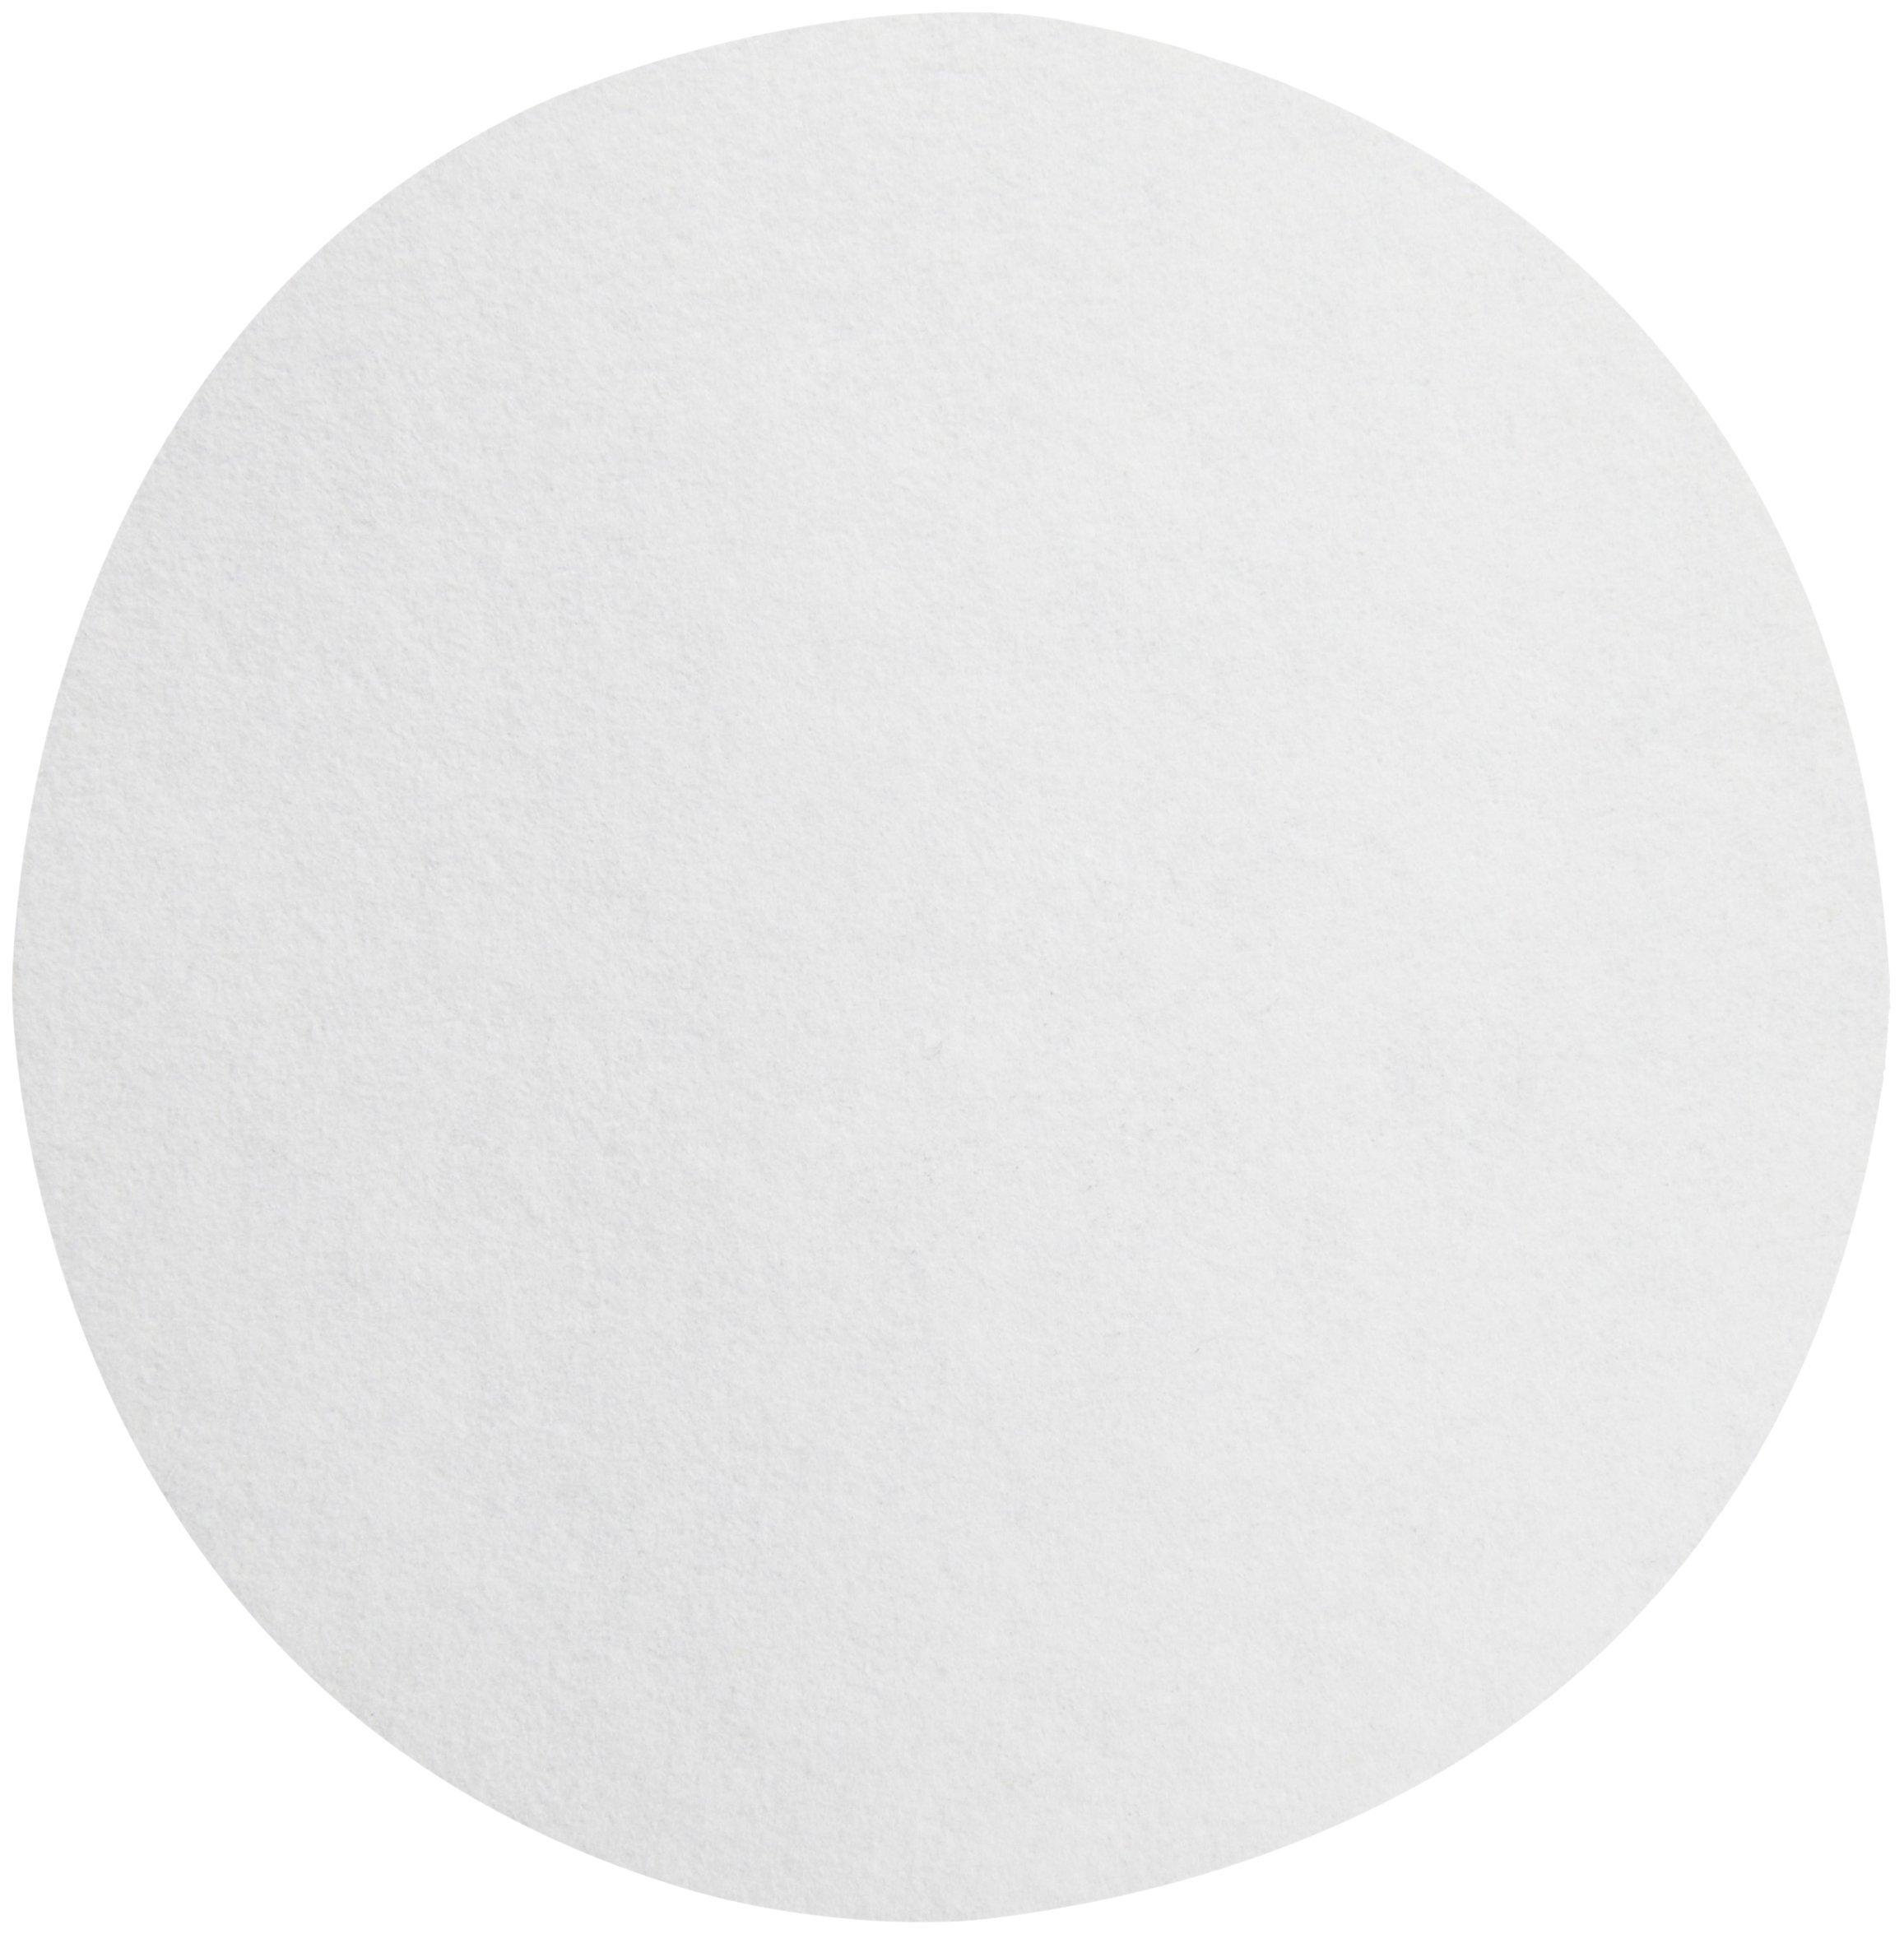 Whatman 1440-070 Ashless Quantitative Filter Paper, 7.0cm Diameter, 8 Micron, Grade 40 (Pack of 100) by Whatman